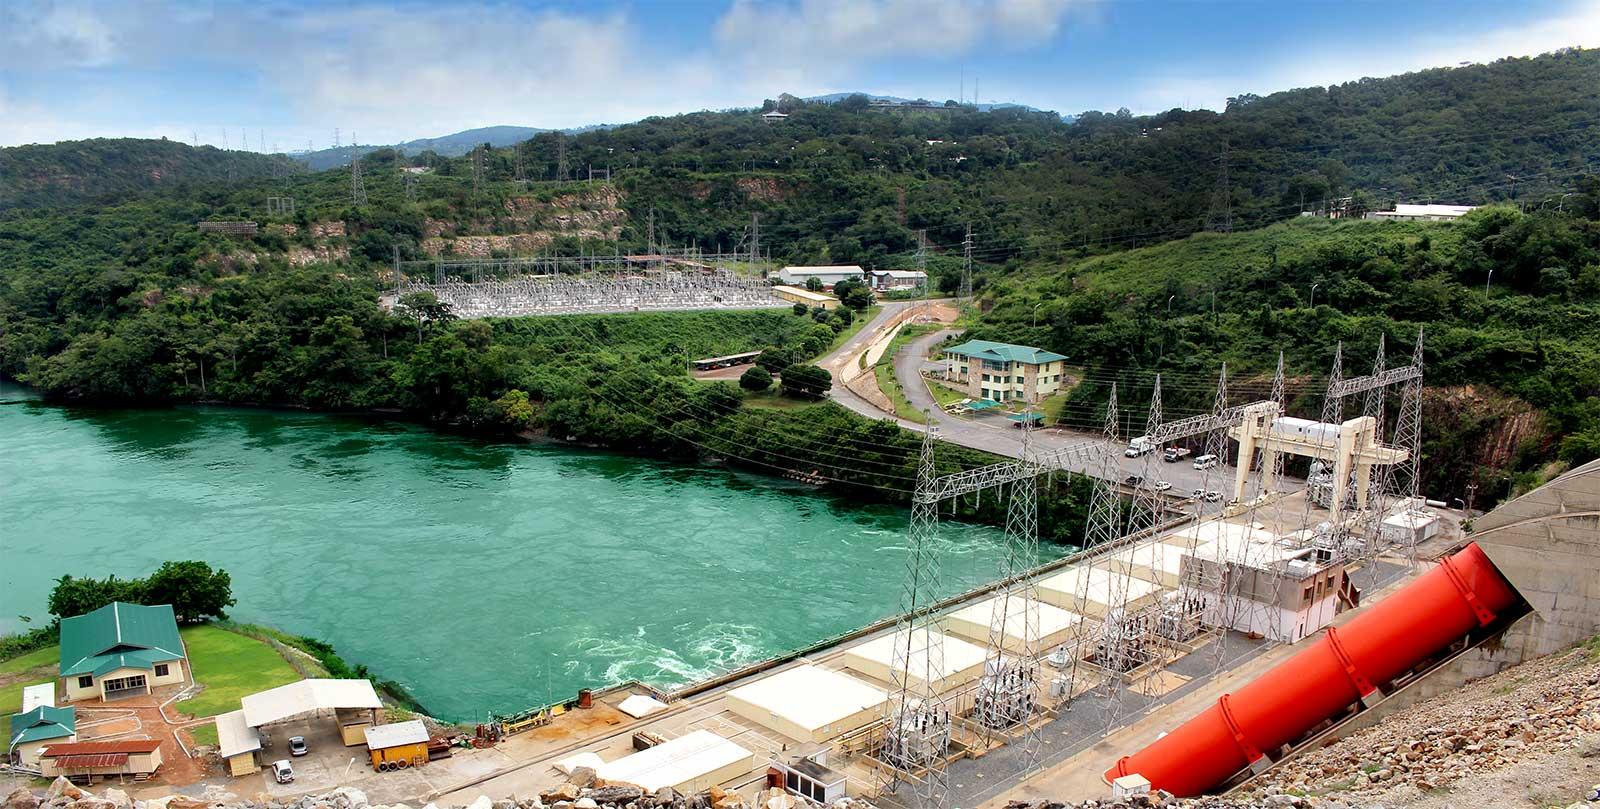 hydro-dam